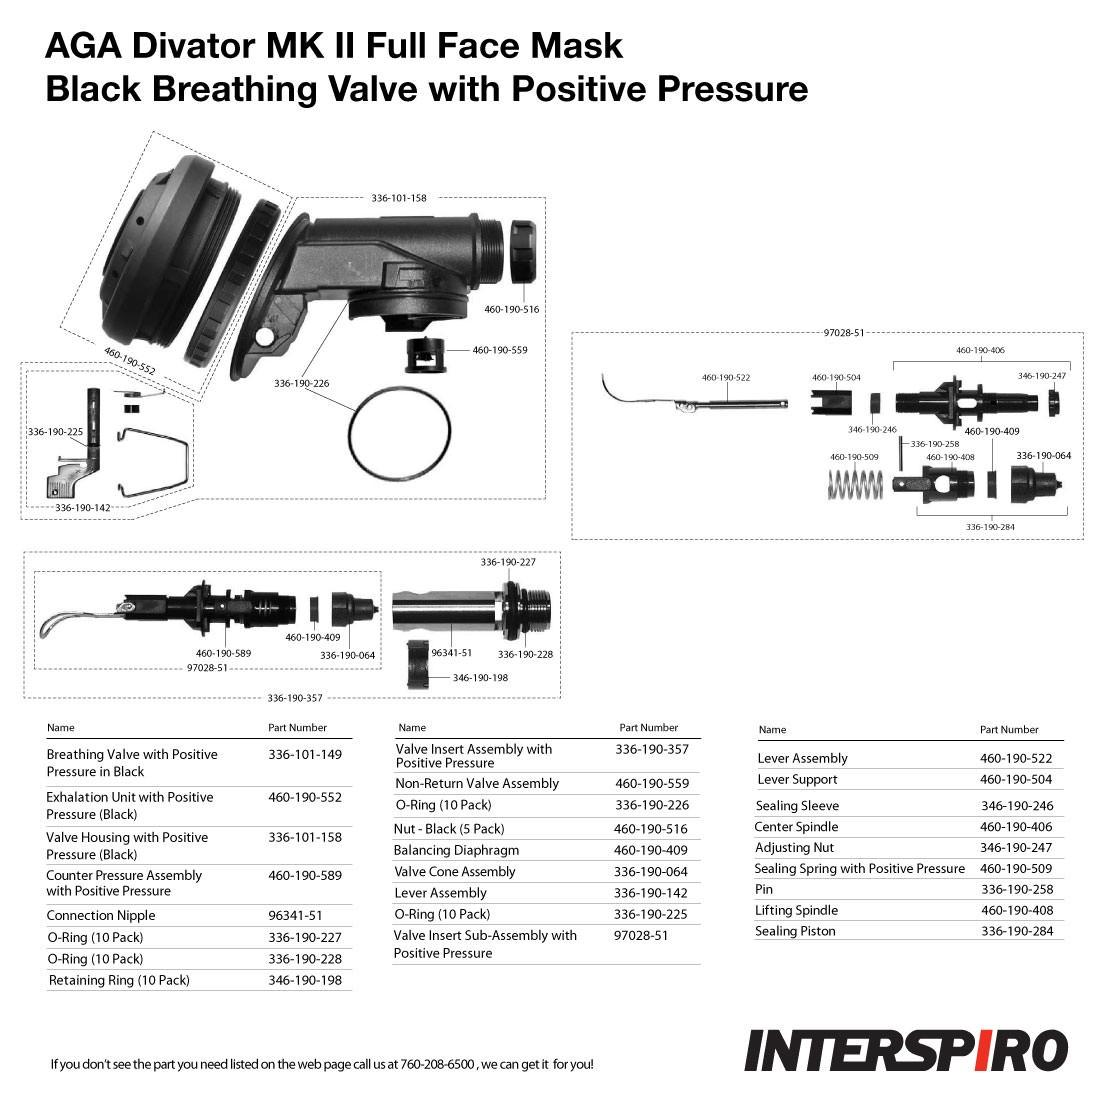 Interspiro AGA Divator MK II Full Face Mask with Positive Pressure Regulator - Natural Rubber - Grey - Breathing Valve